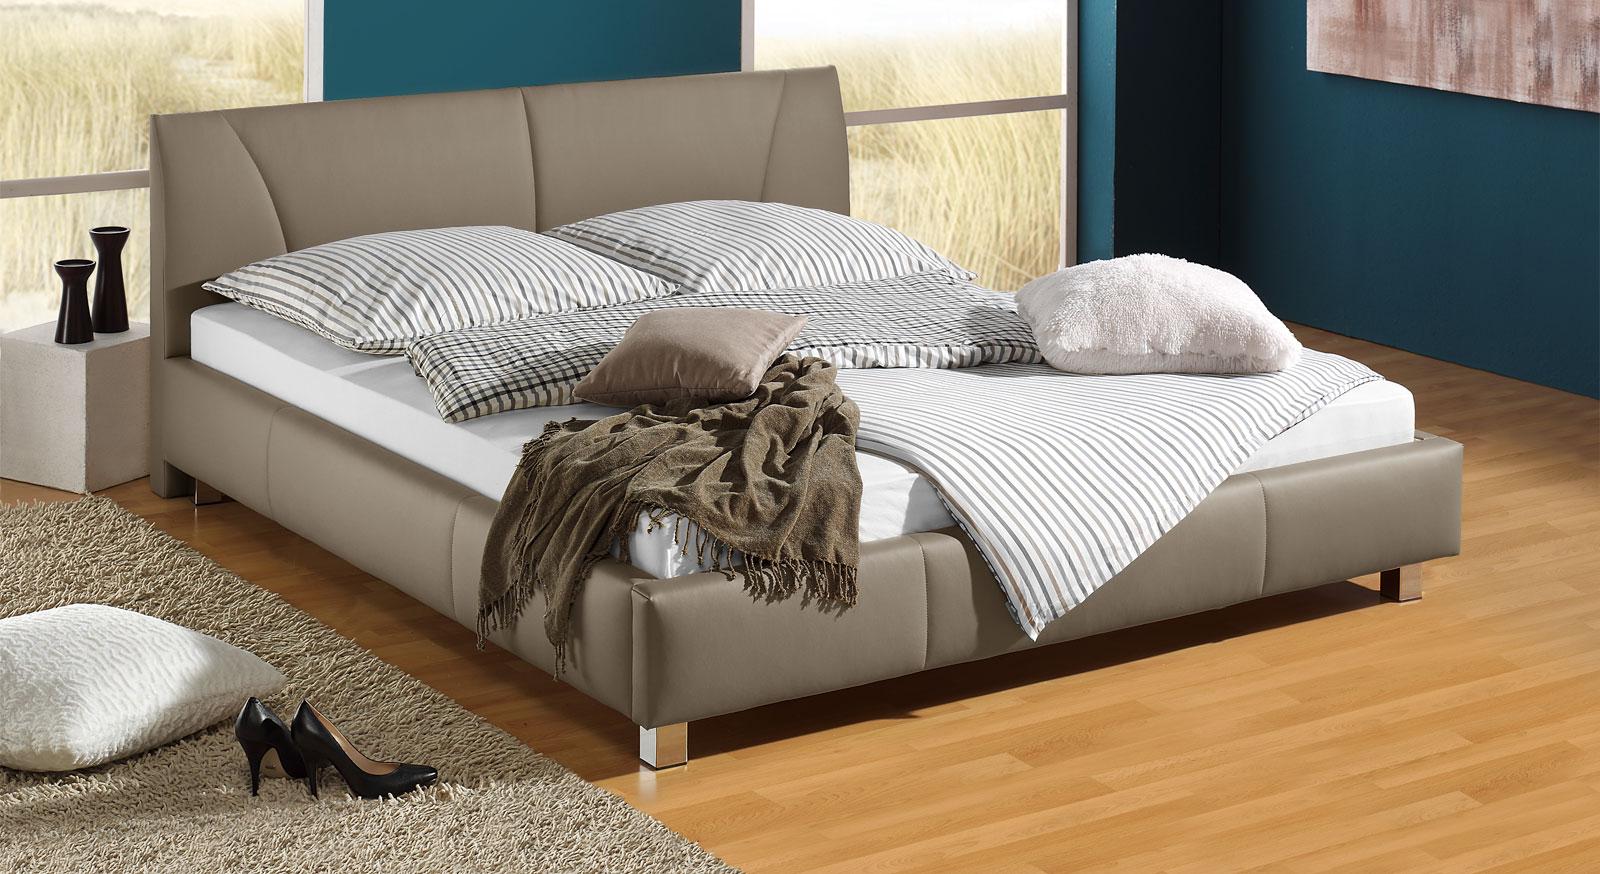 g nstiges polsterbett z b in wei 140x200 cm sona. Black Bedroom Furniture Sets. Home Design Ideas